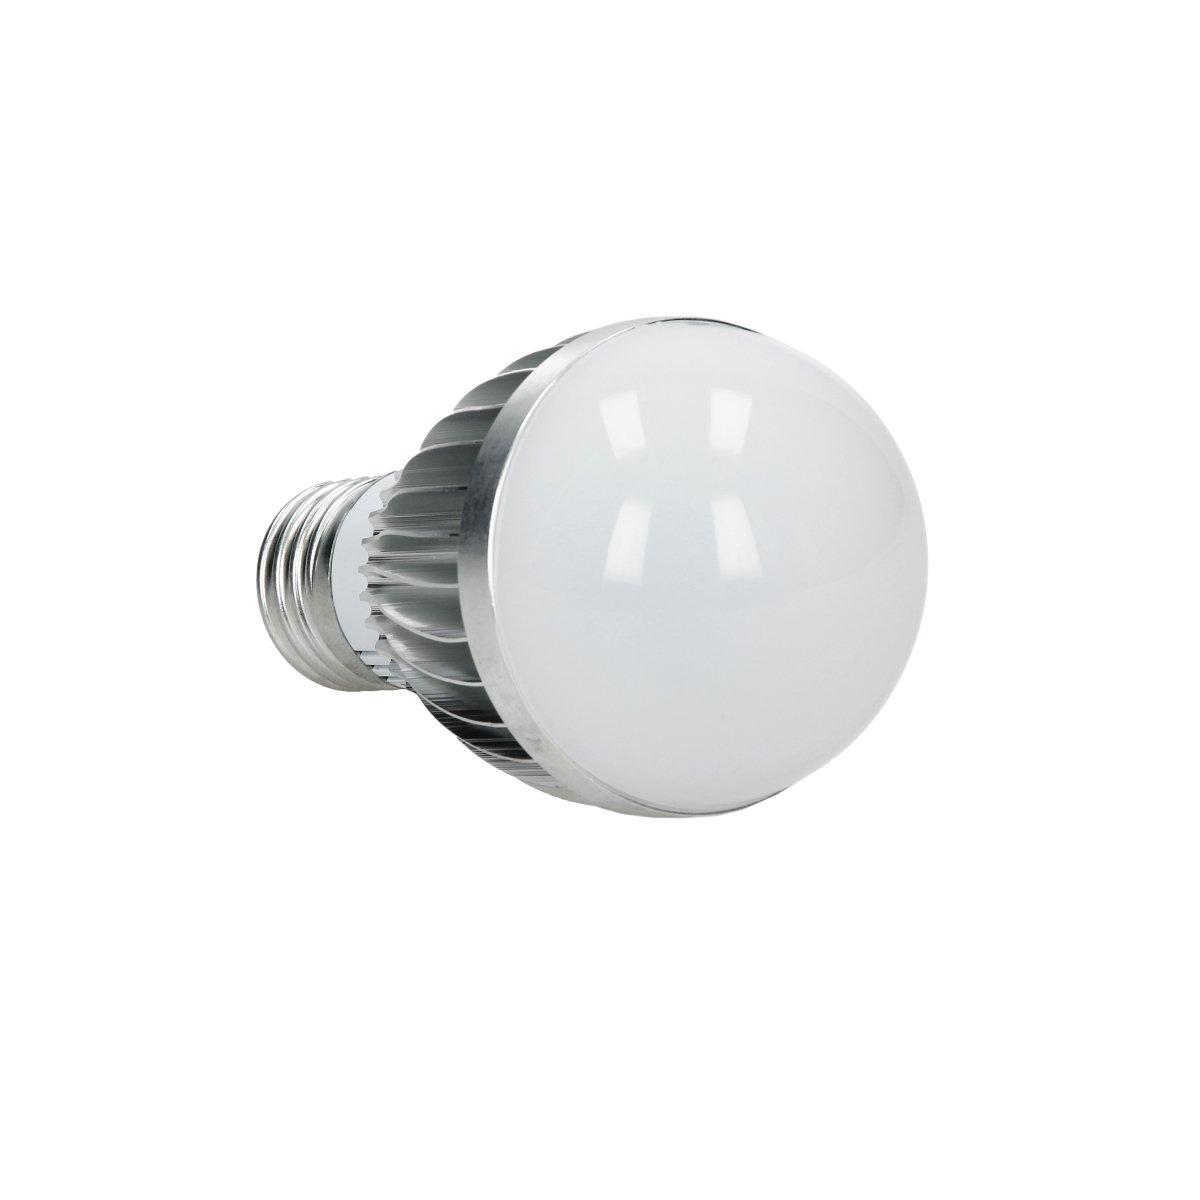 E27 - 5 Watt 10-er Pack ECD Germany 10-er Pack E27 LED Birne RGB 5W DIMMBAR AC 220-240V 16 Farben bis 417 Lumen 120° Abstrahlwinkel inkl. IR-Fernbedienung mit 24 Tasten